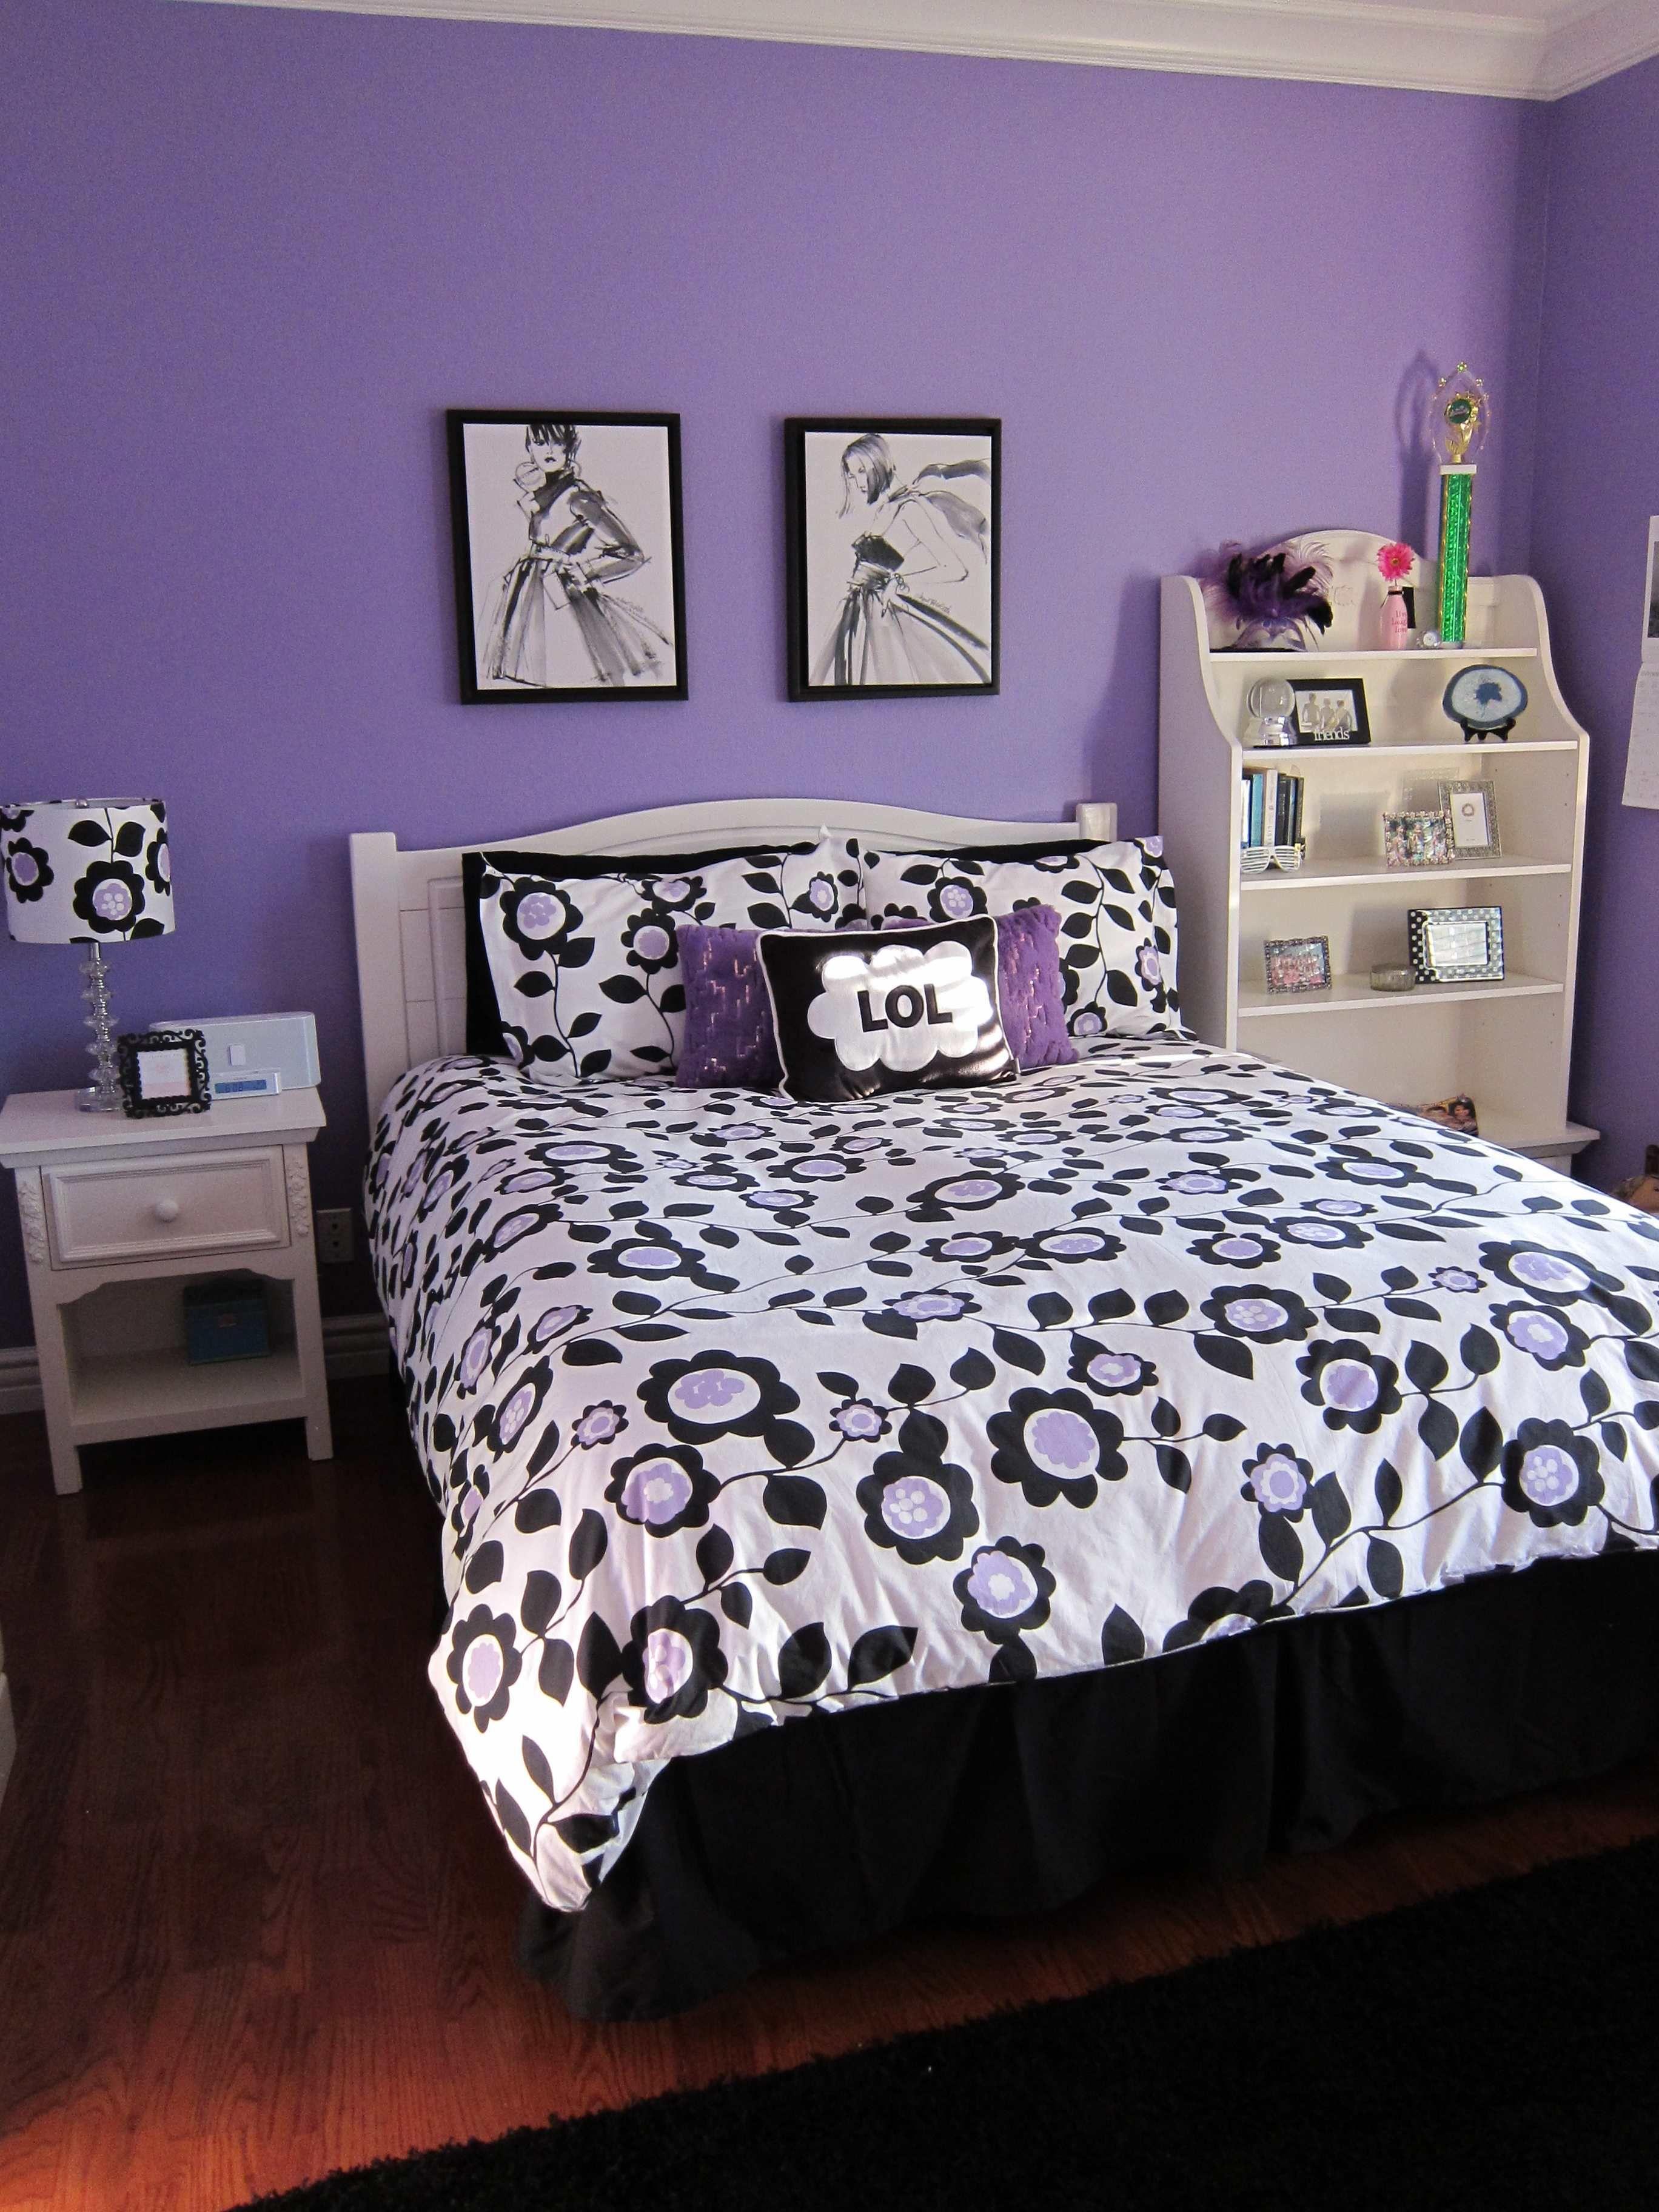 Trendy Teenage Bedroom Ideas Small Space Girls Room Colors